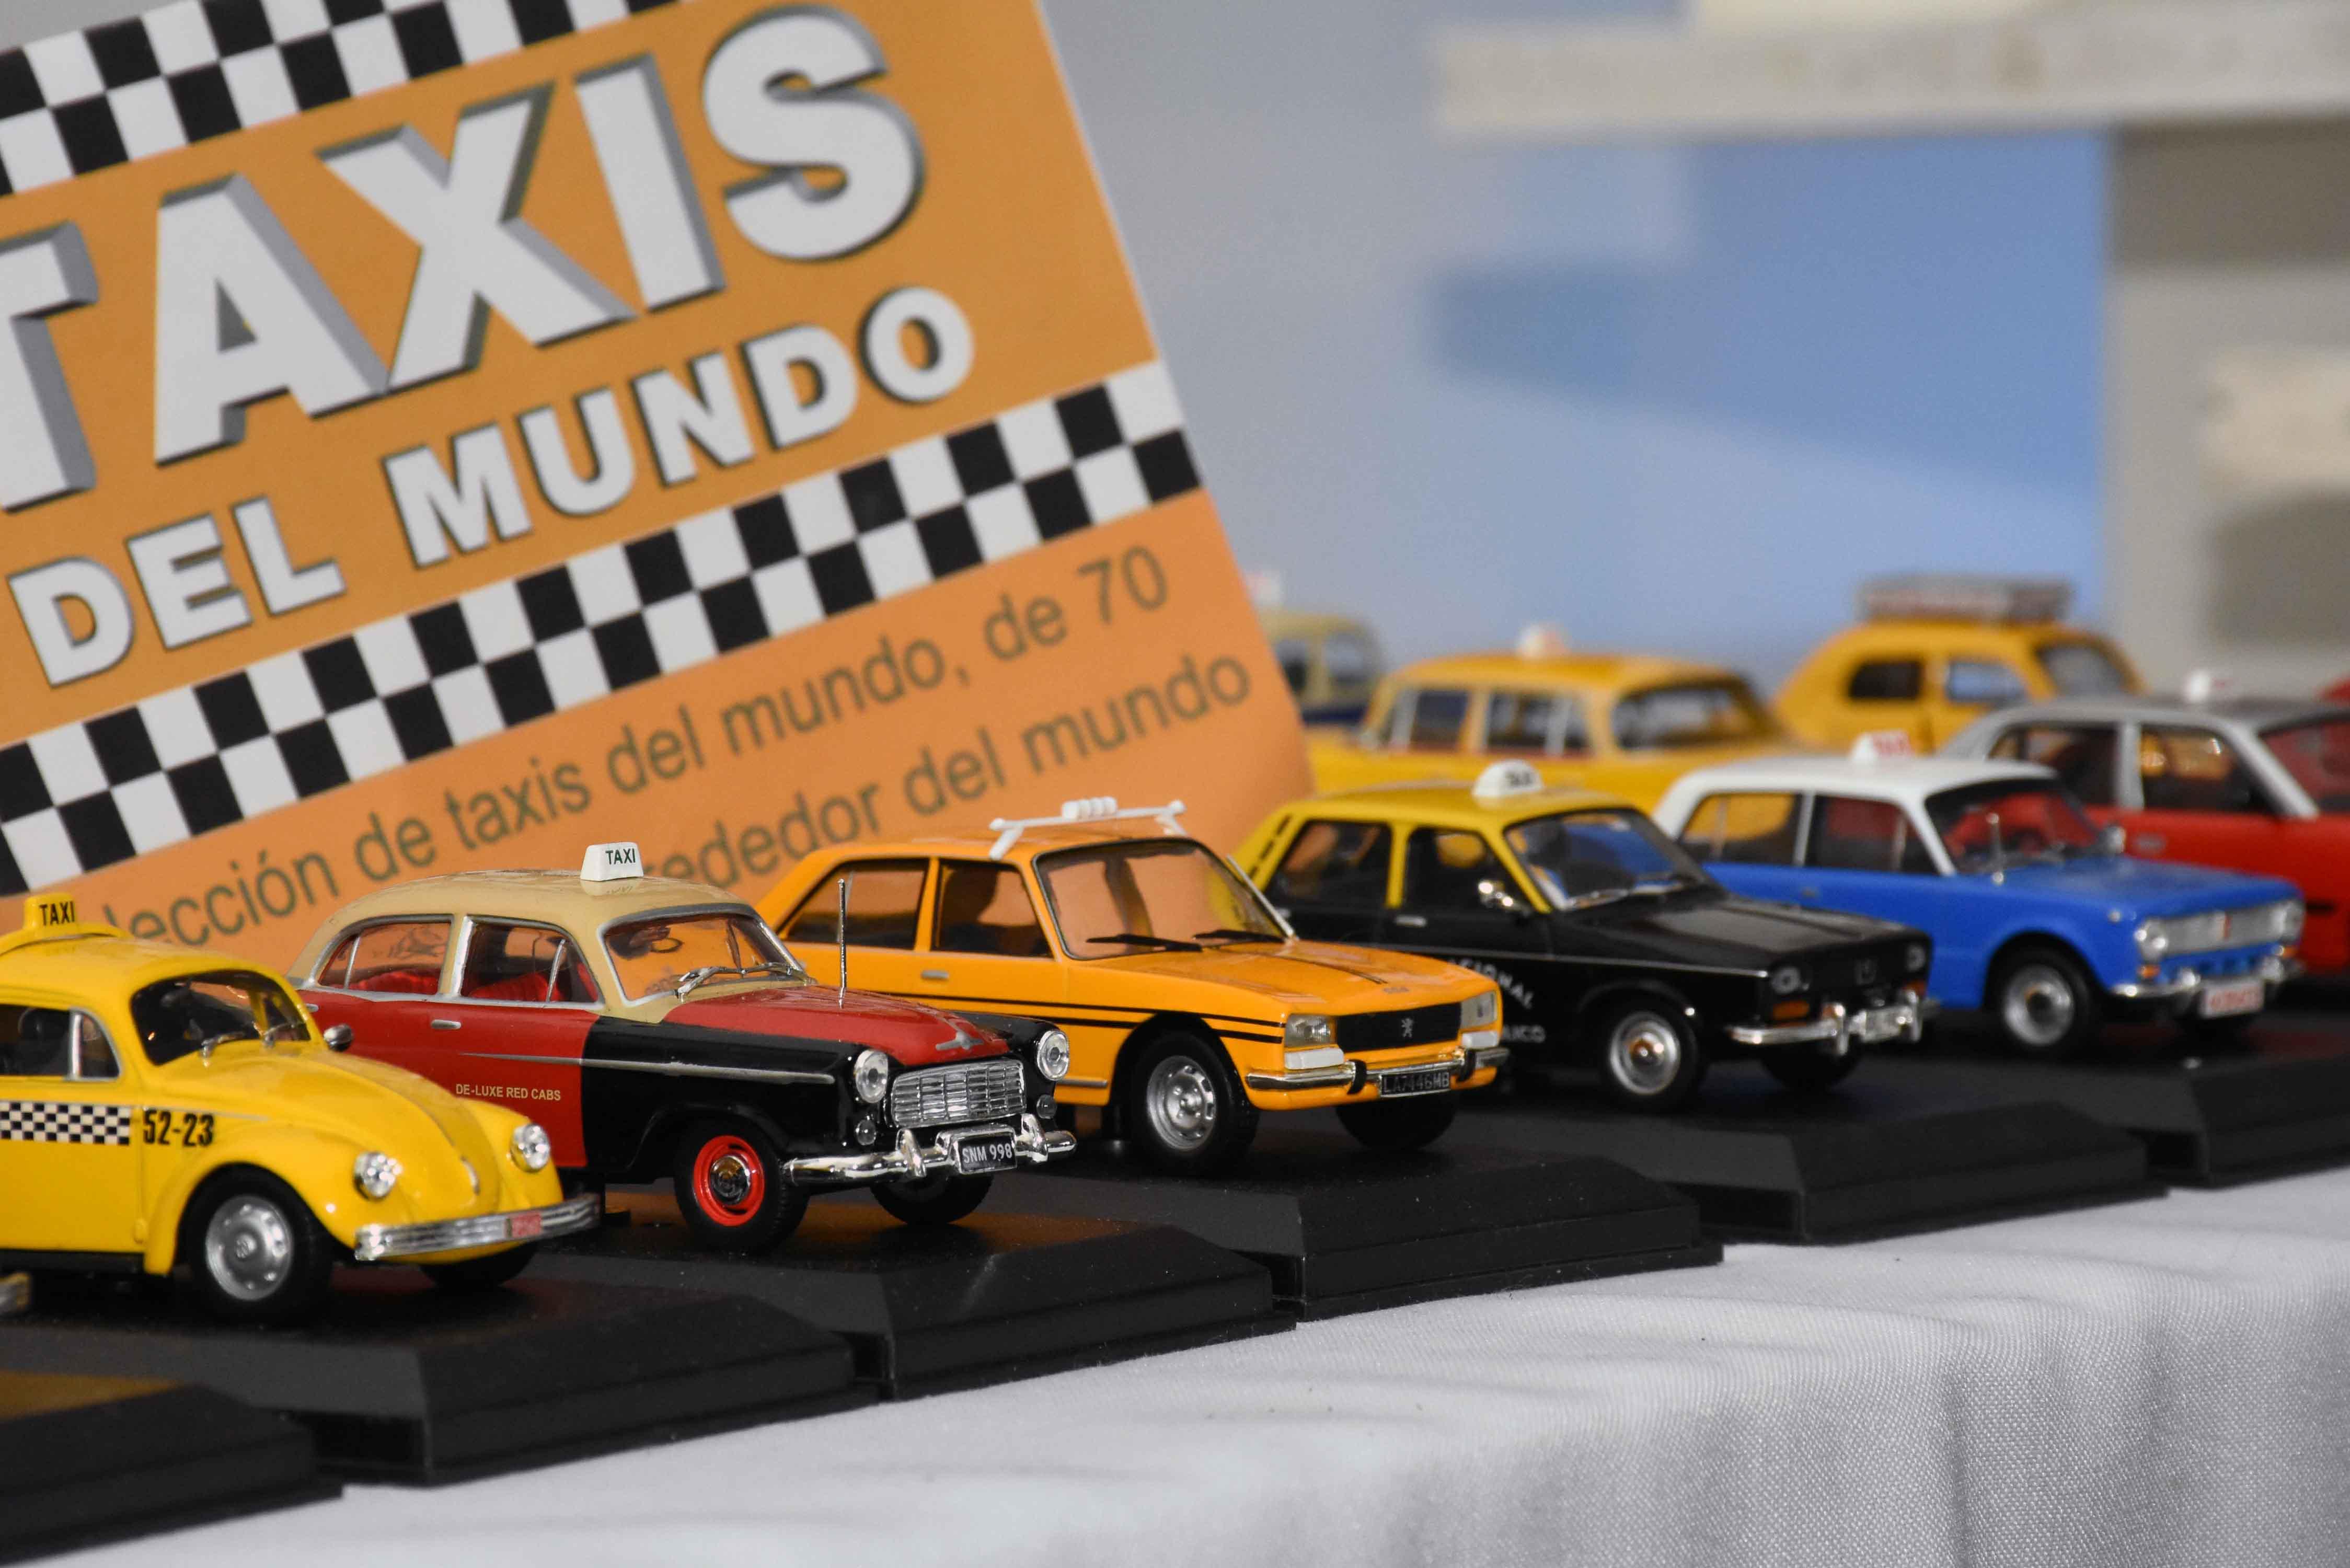 Exposición de autos a escala en La Barraca (16)